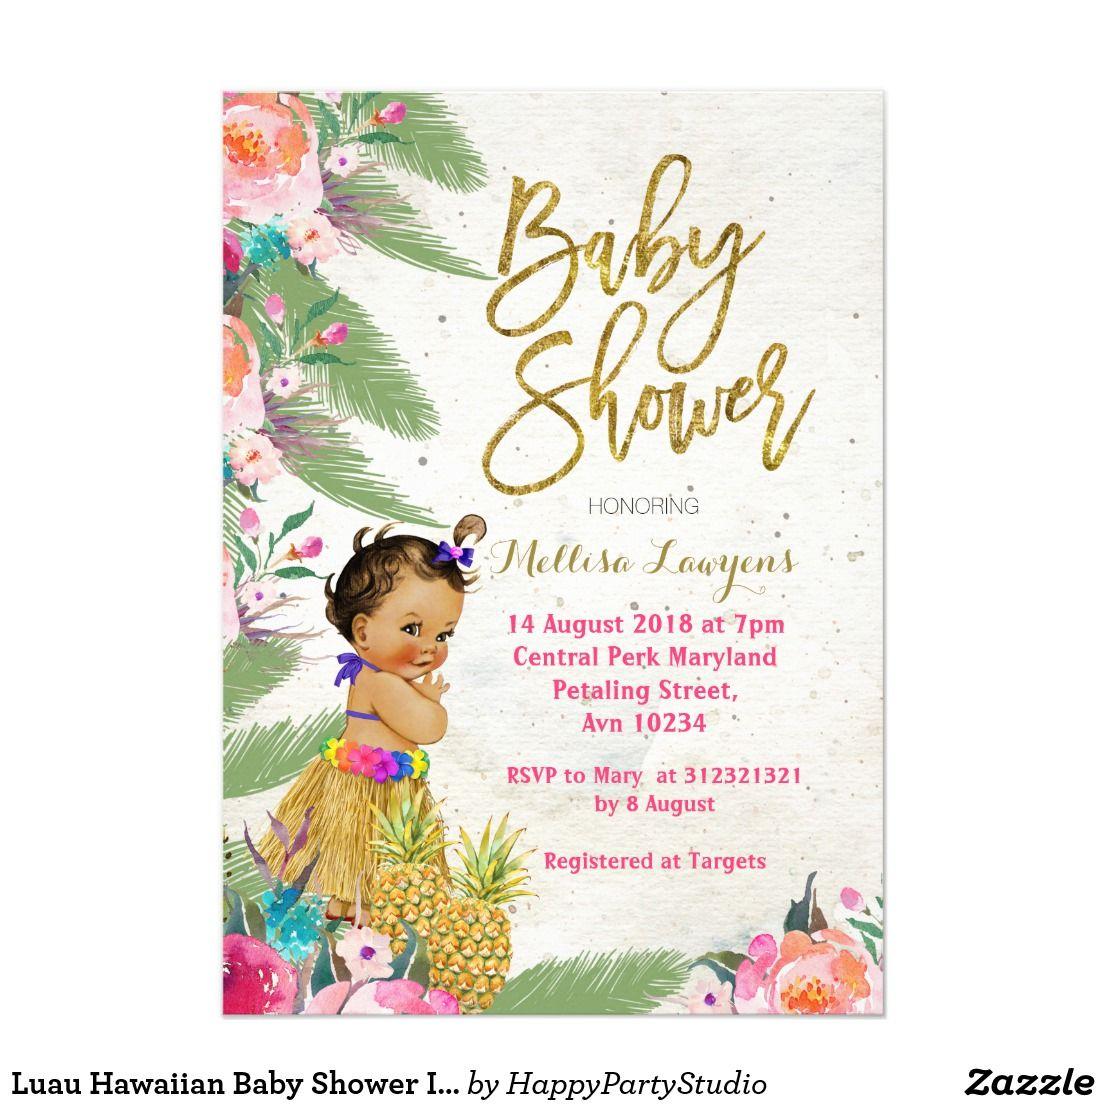 Luau Hawaiian Baby Shower Invitation | Baby Shower Invitations,Birth ...